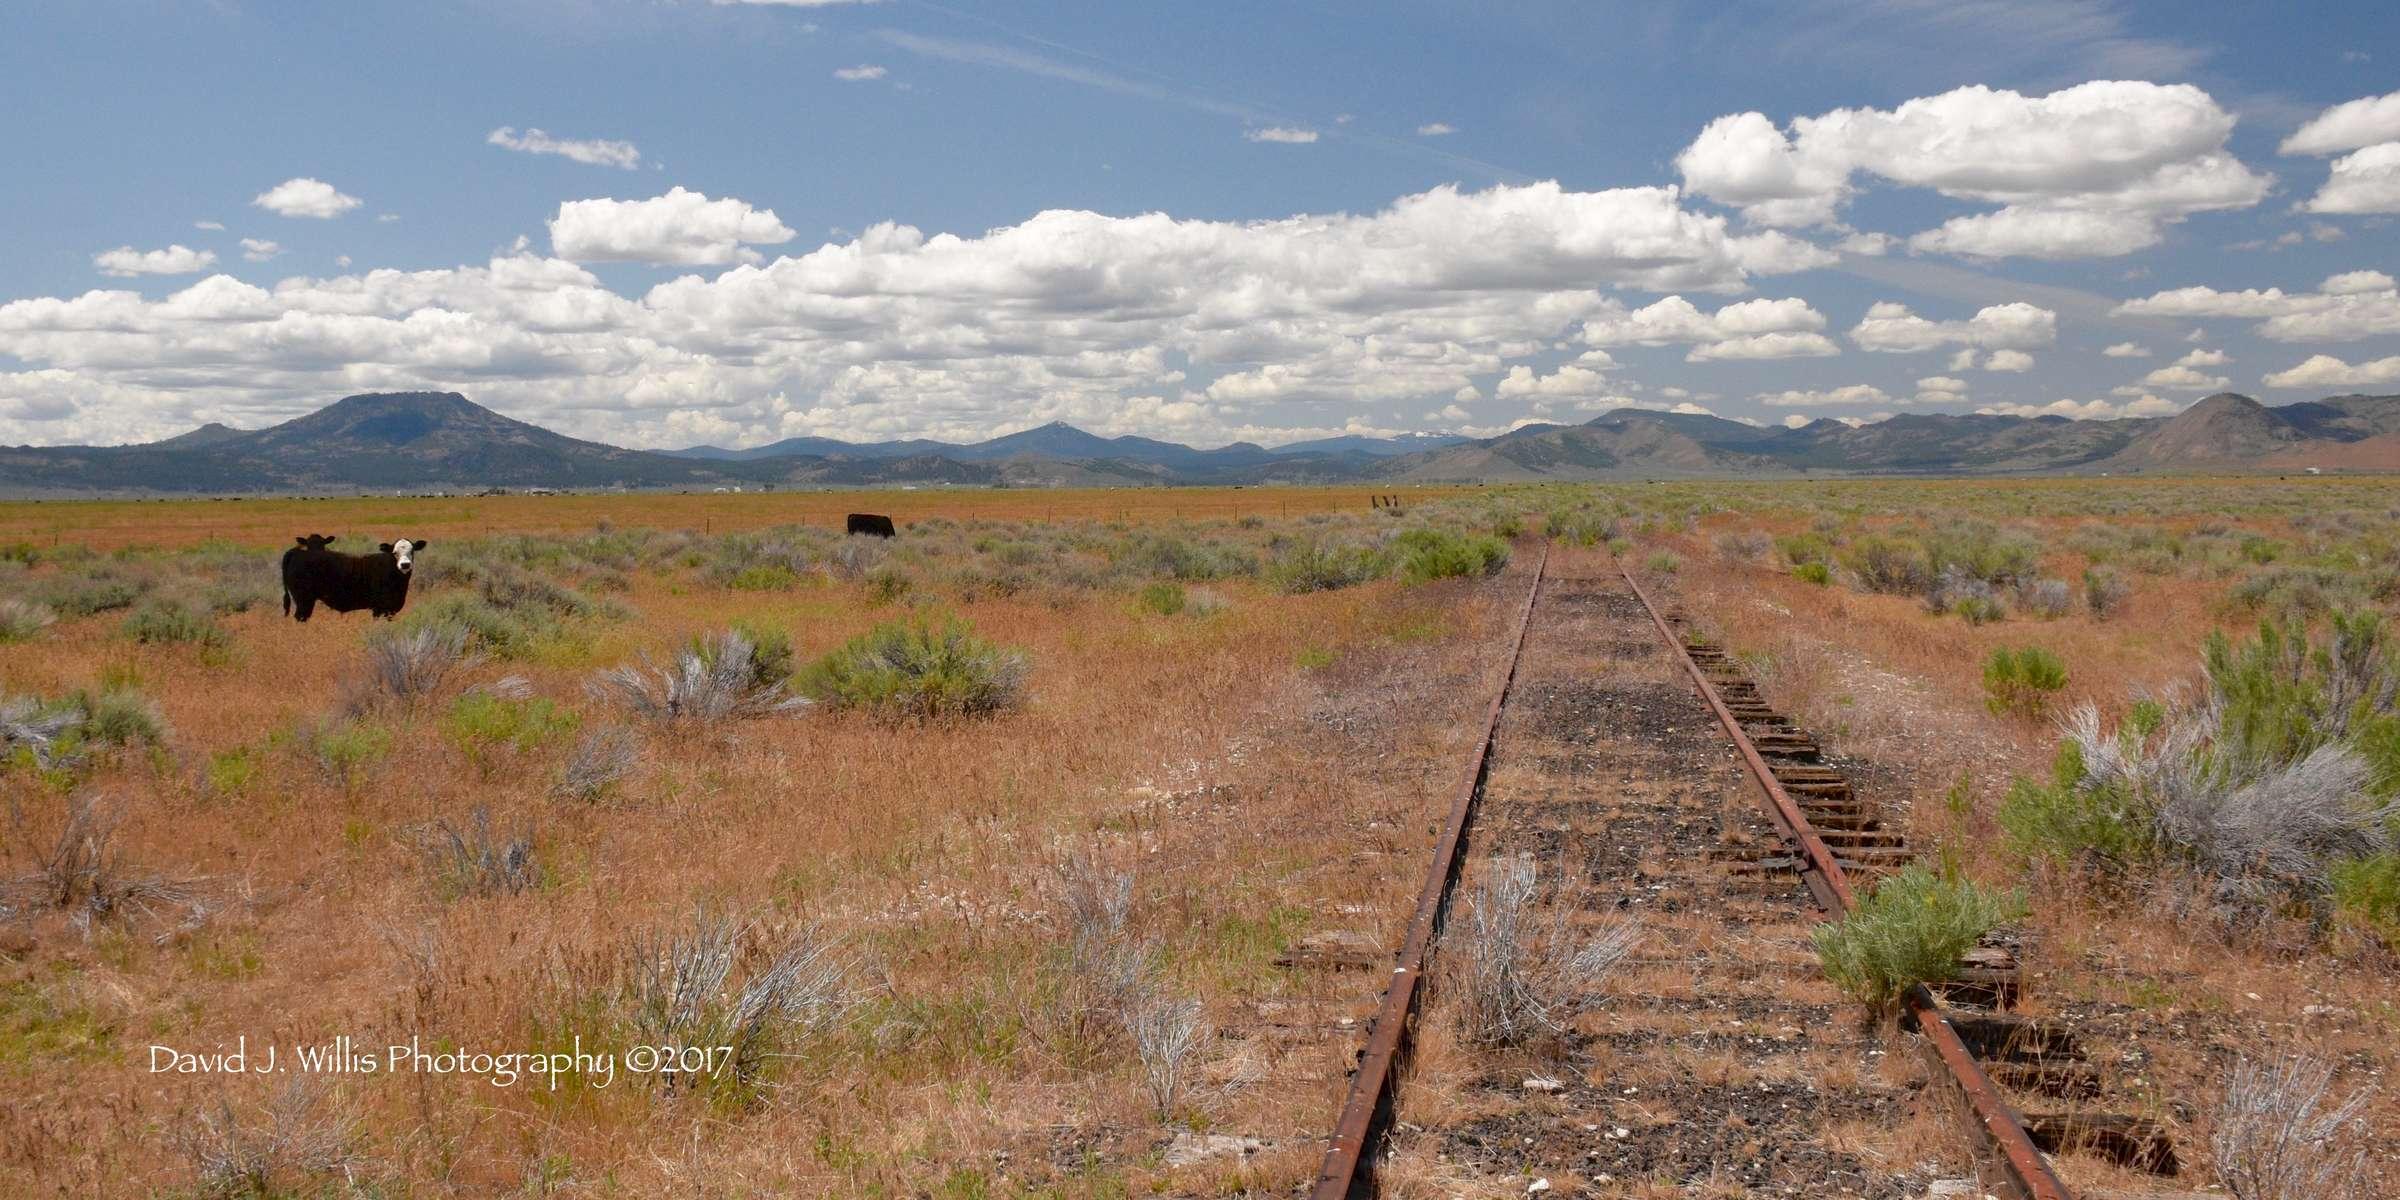 Sierra Valley, Train Tracks, Cows, Plumas County